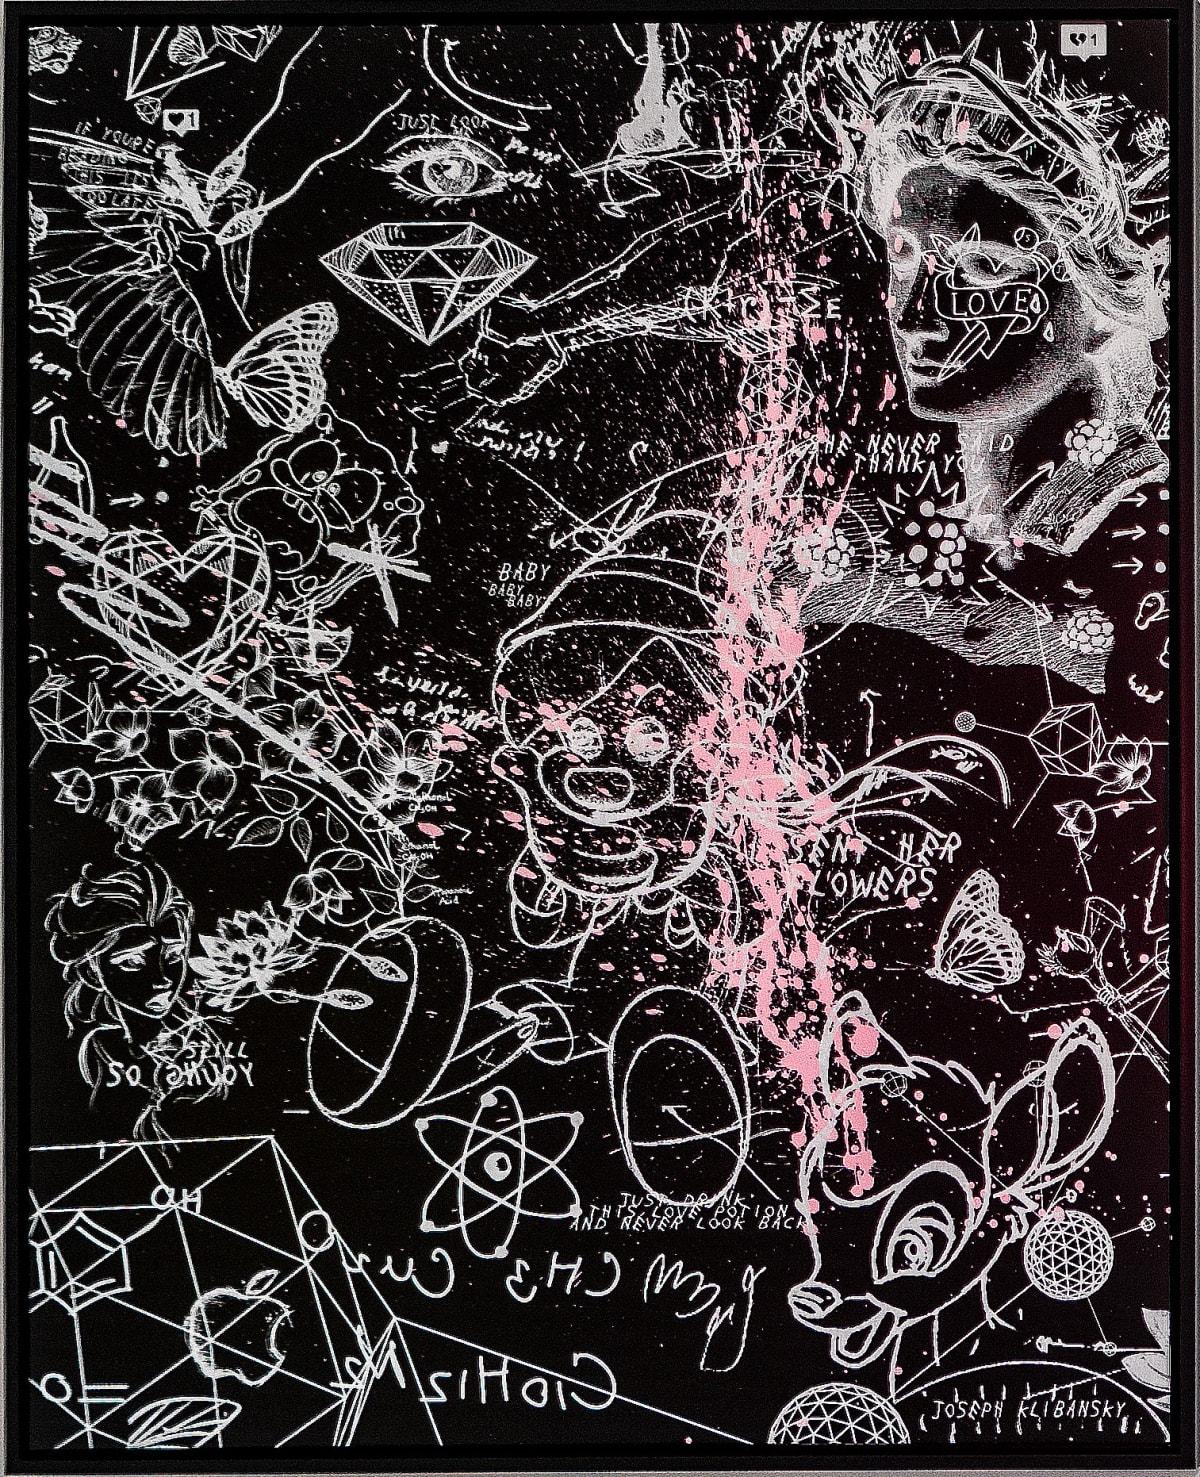 Joseph Klibansky, I Sent Her Flowers (black, white, pastel pink splash), 2019